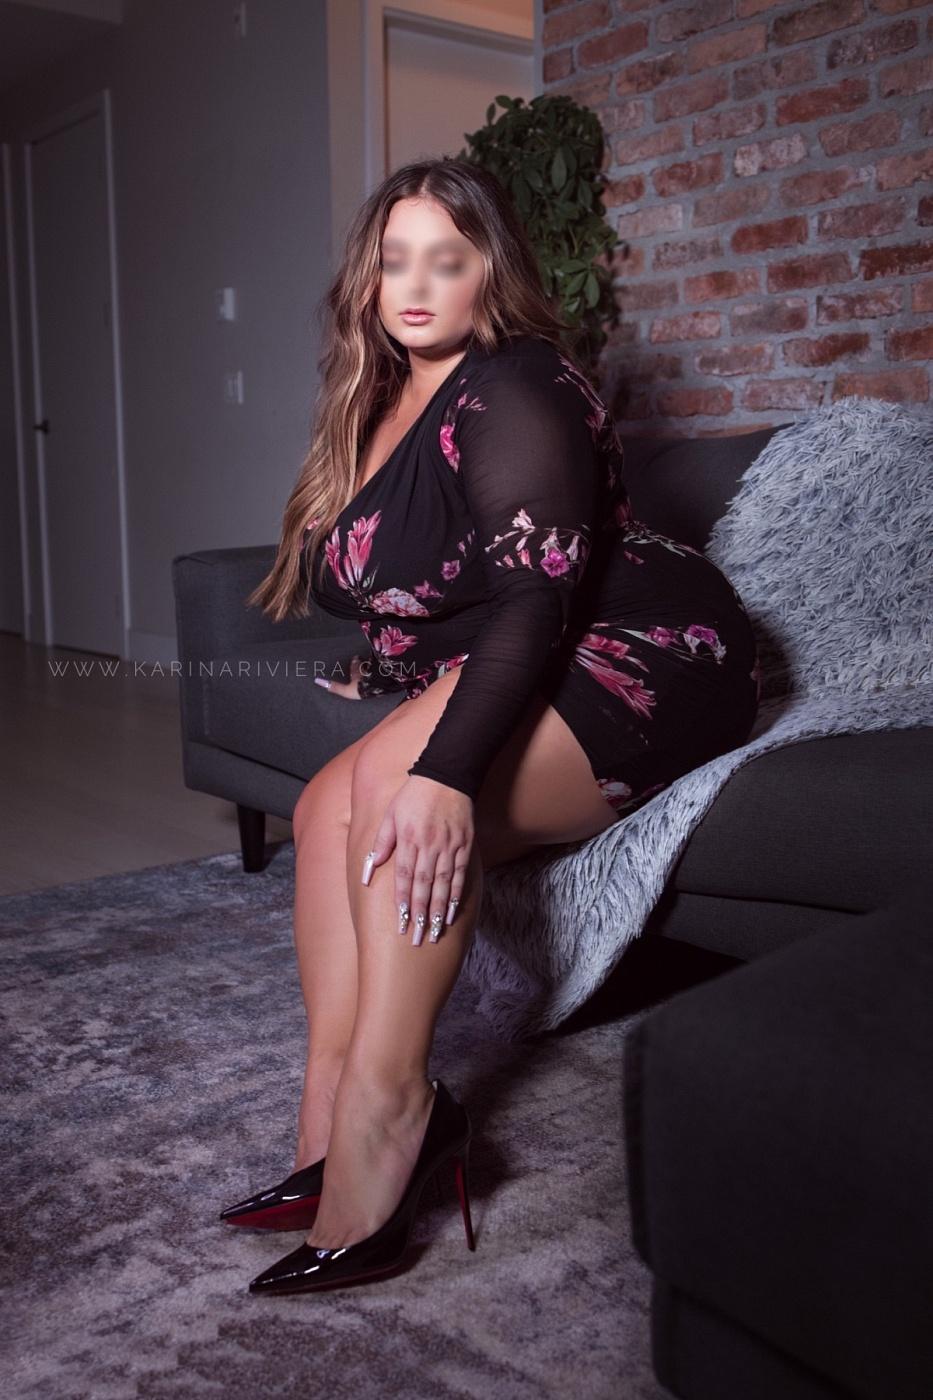 Karina Riviera